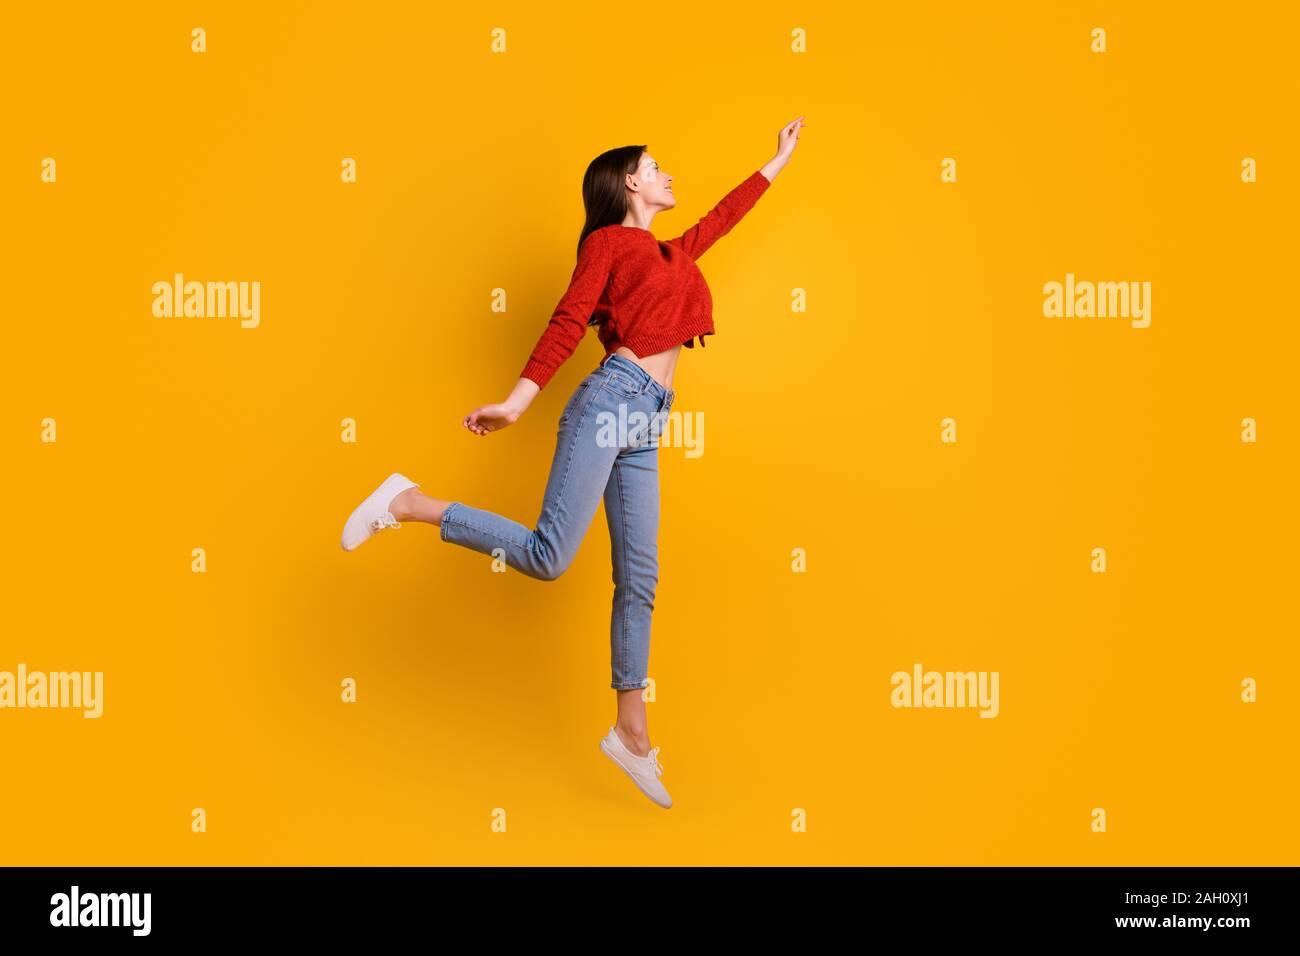 Girl Star Jump Air Stockfotos & Girl Star Jump Air Bilder